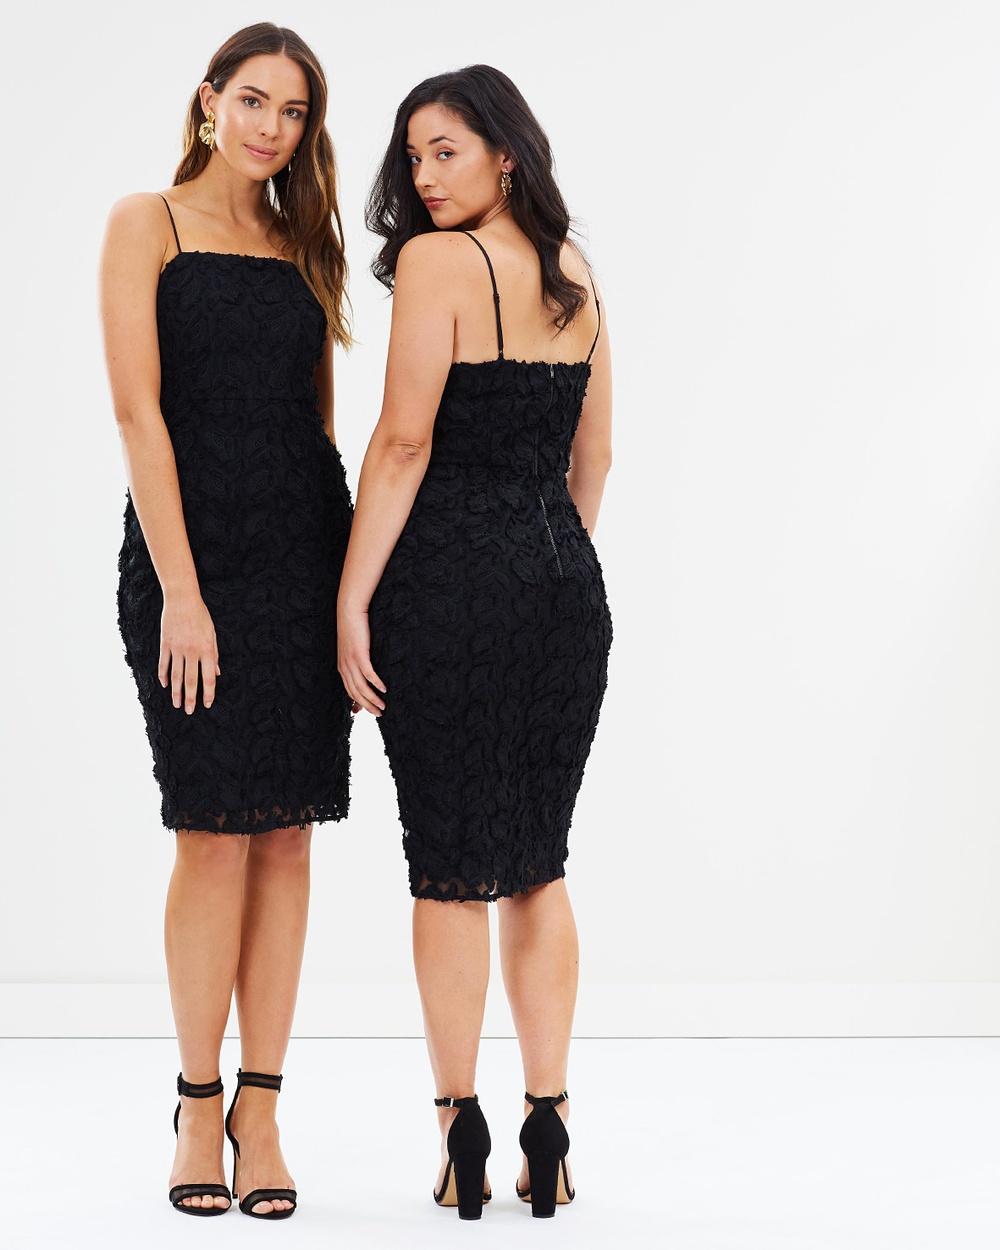 Cooper St Floral Mirage Lace Midi Dress Bodycon Dresses Black Floral Mirage Lace Midi Dress